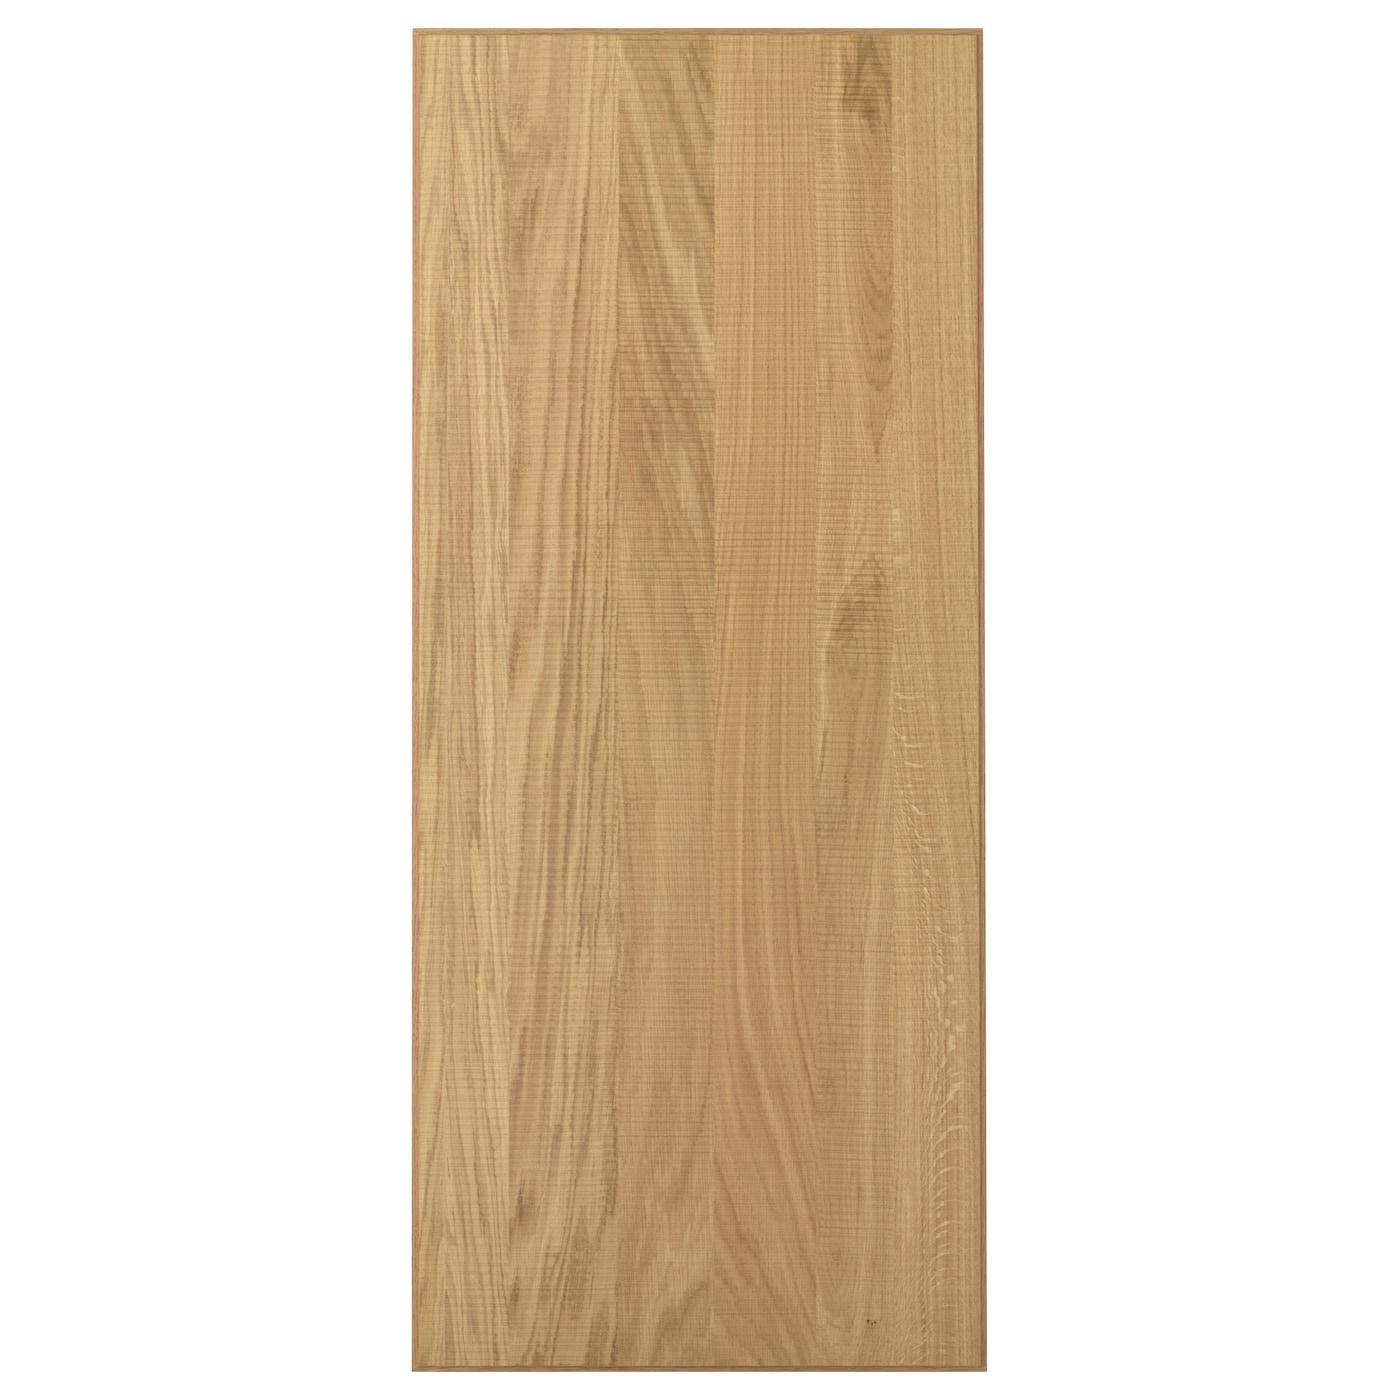 HYTTAN Door Oak veneer 60×140 cm  IKEA -> Kuchnie Ikea Hyttan